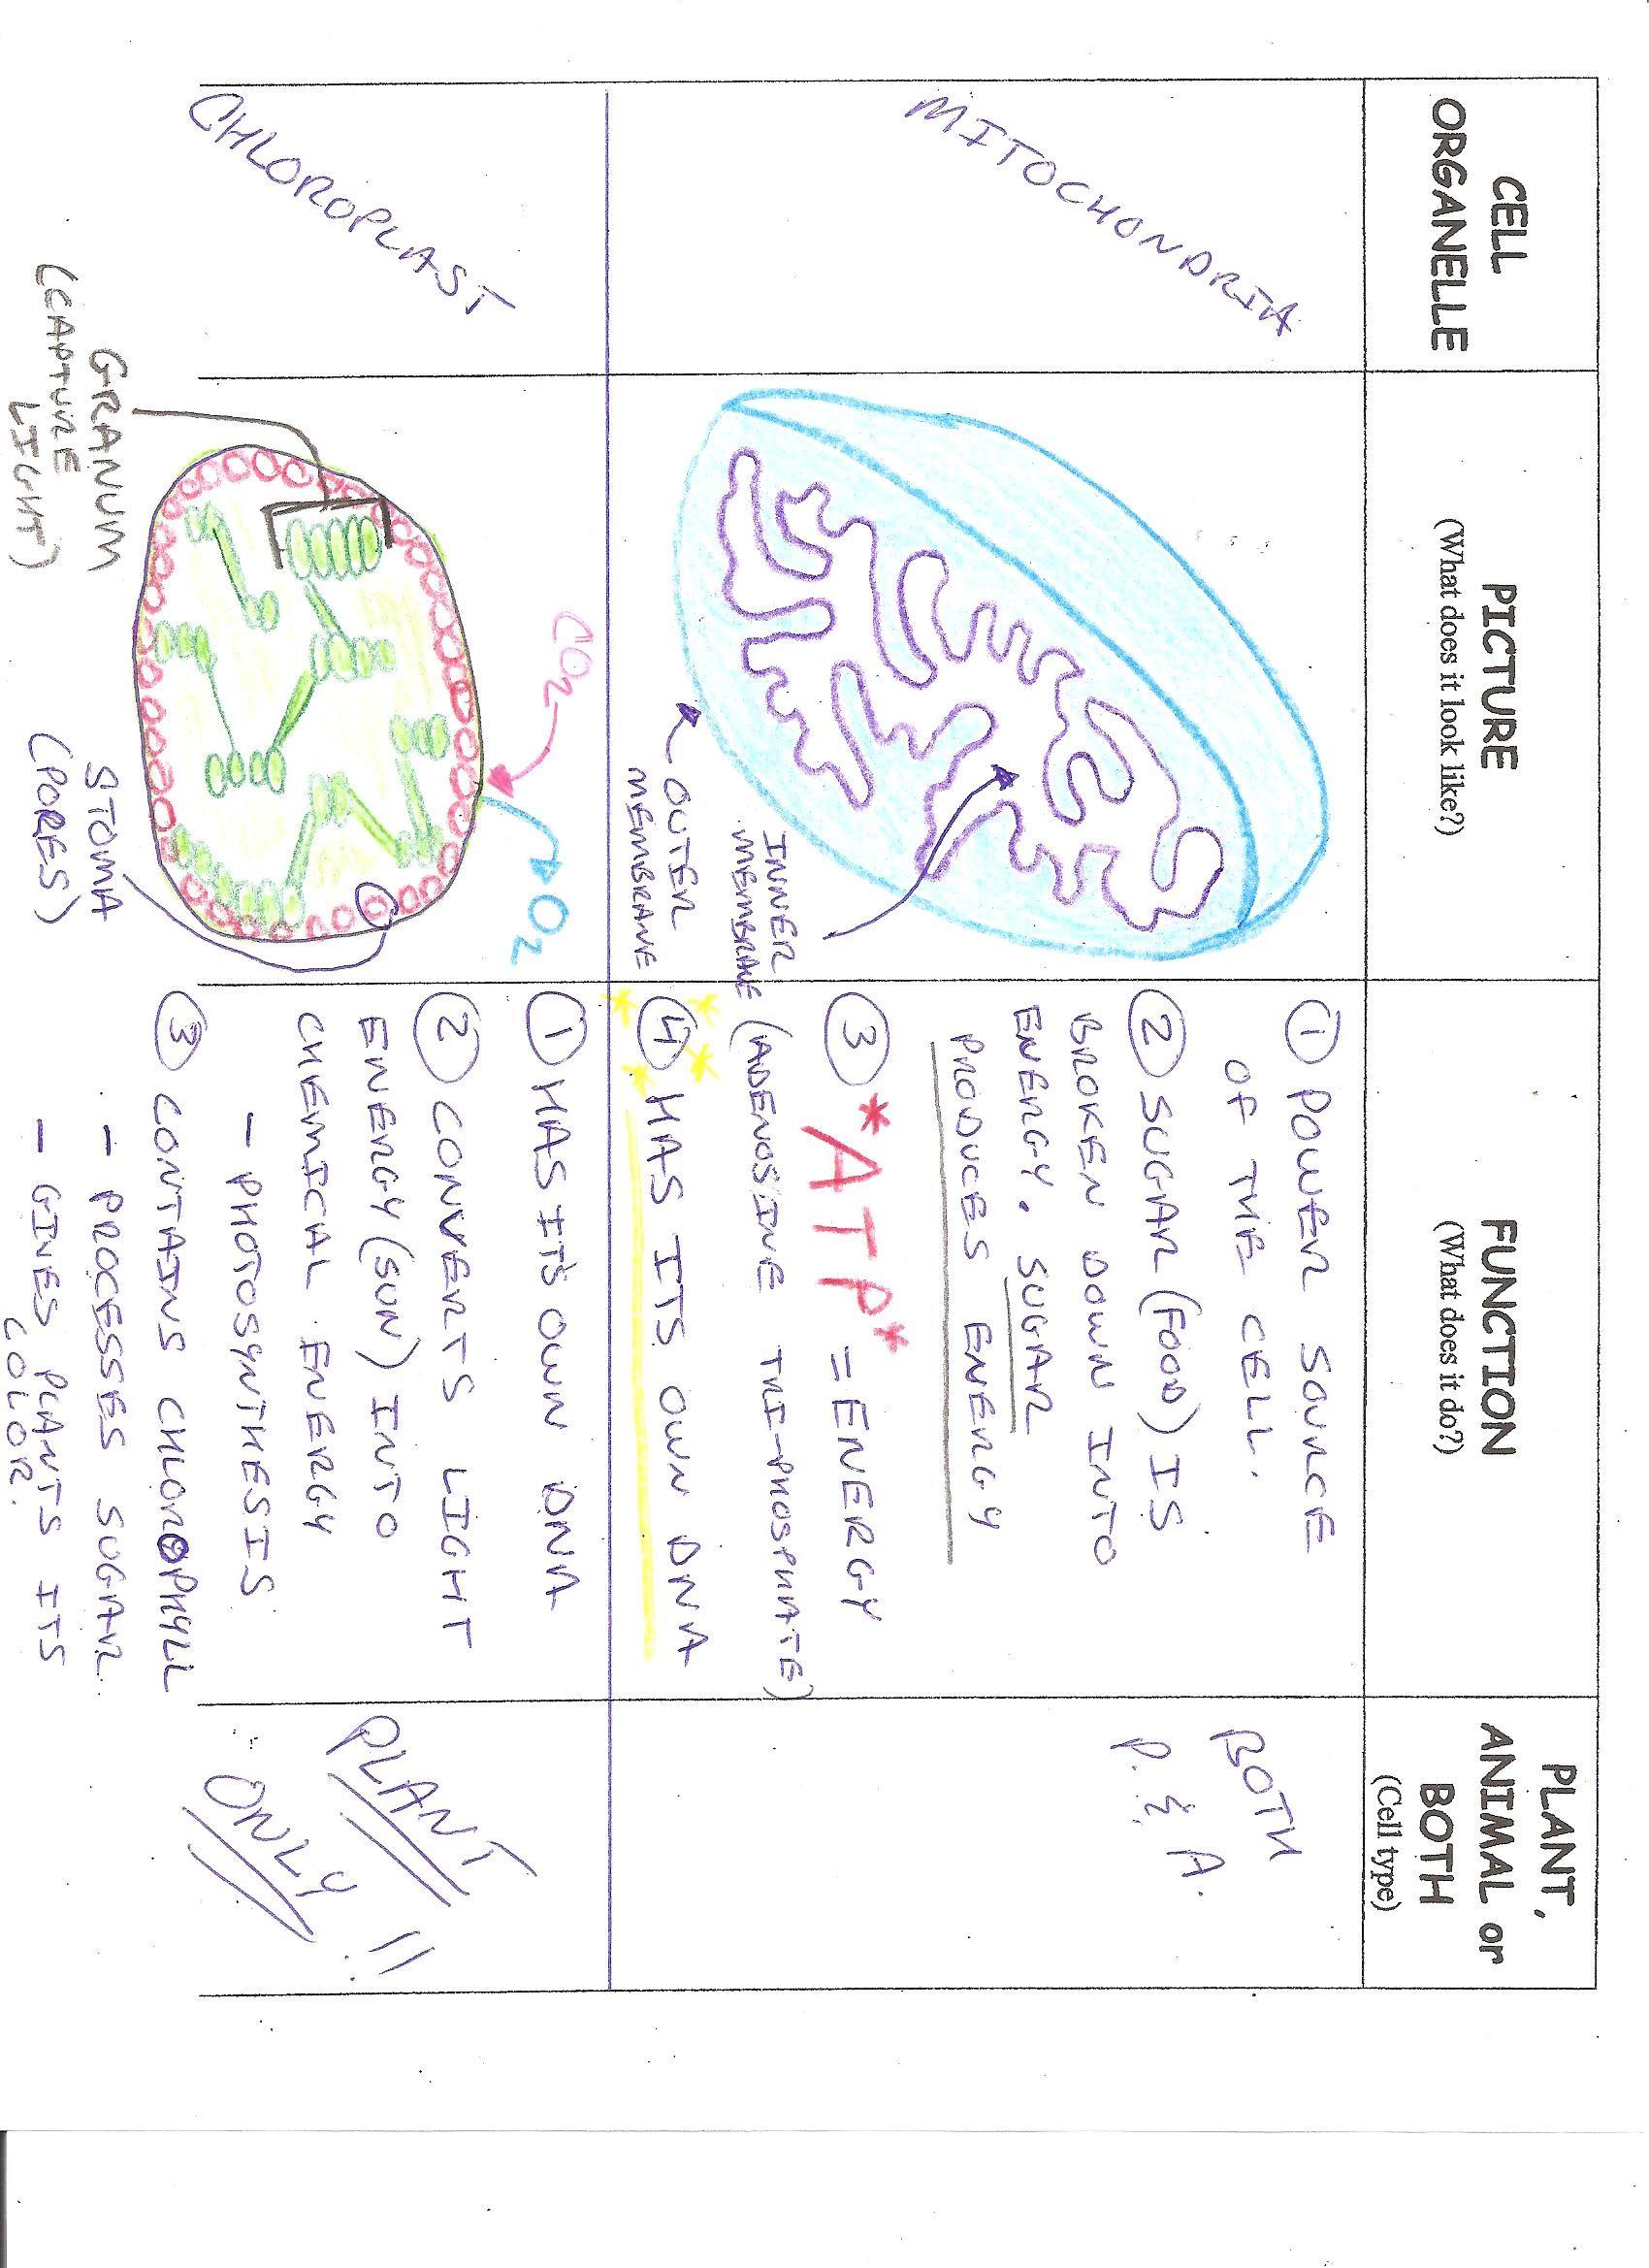 Classwork Assignments